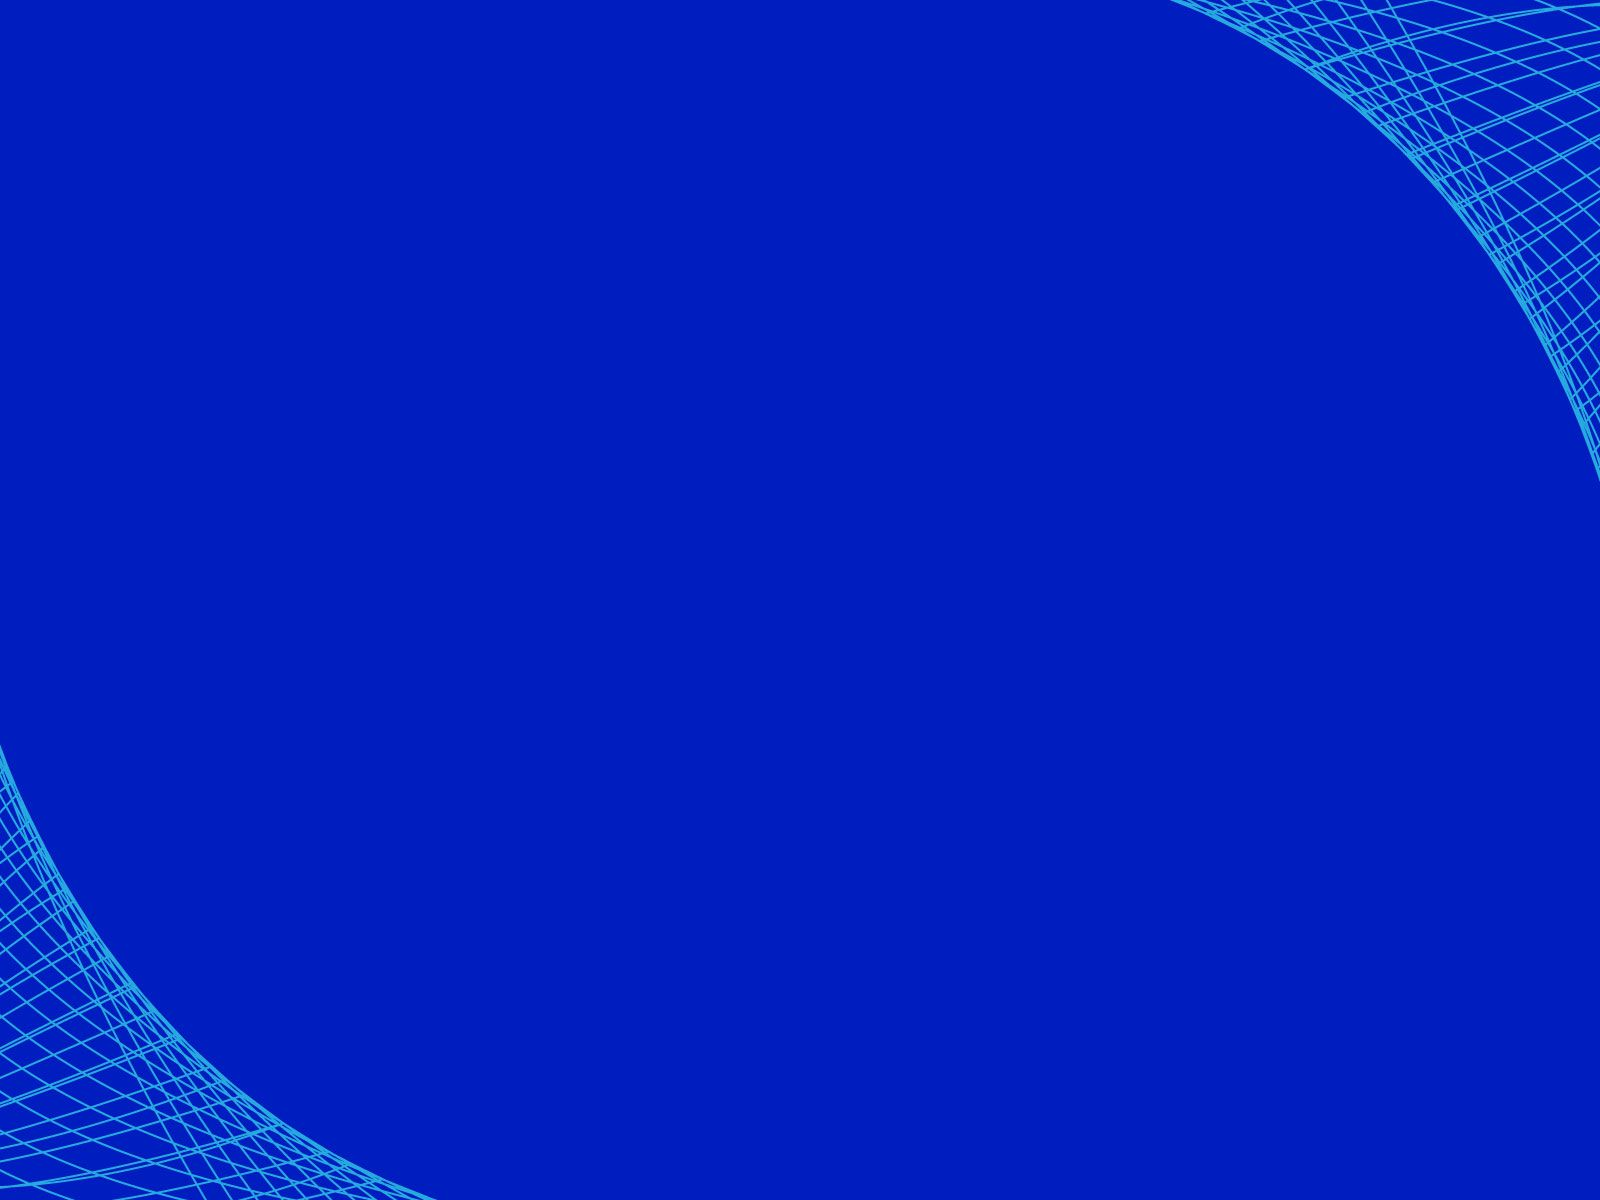 Blue Classy Slide Template backgrounds | Power Point | Pinterest ...